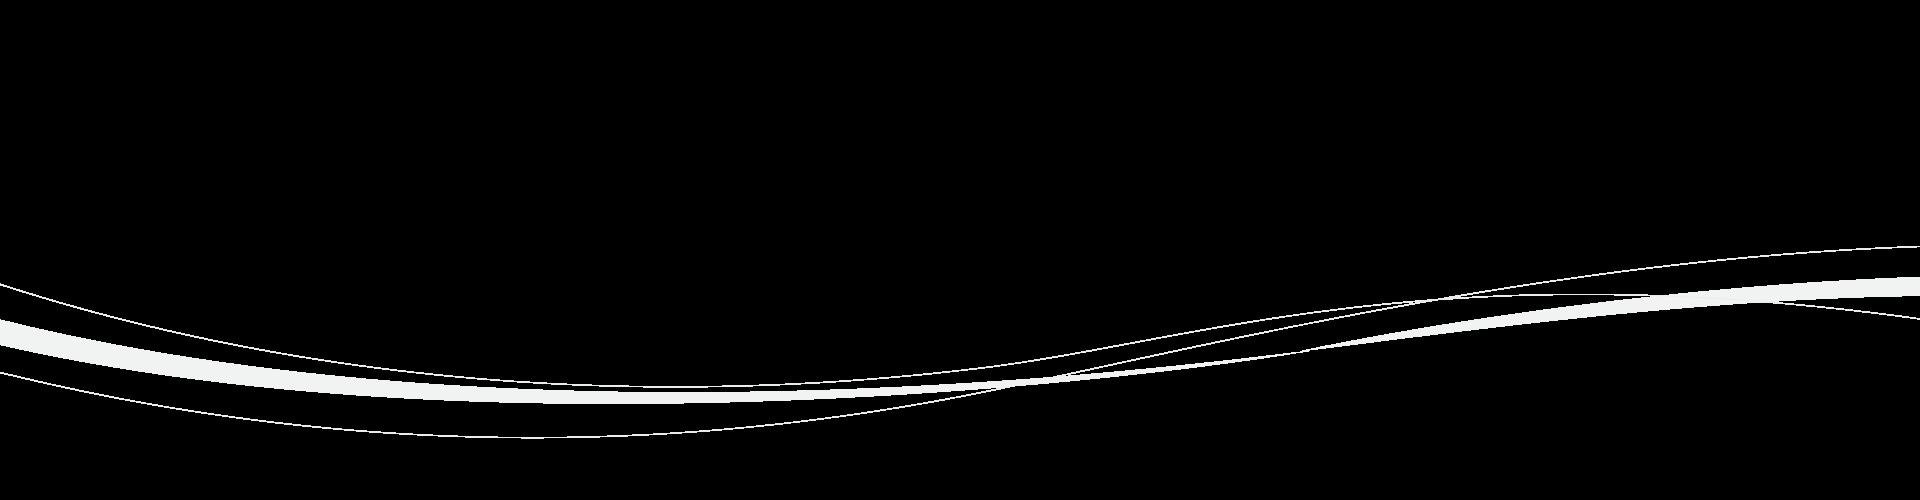 grey_lines_5